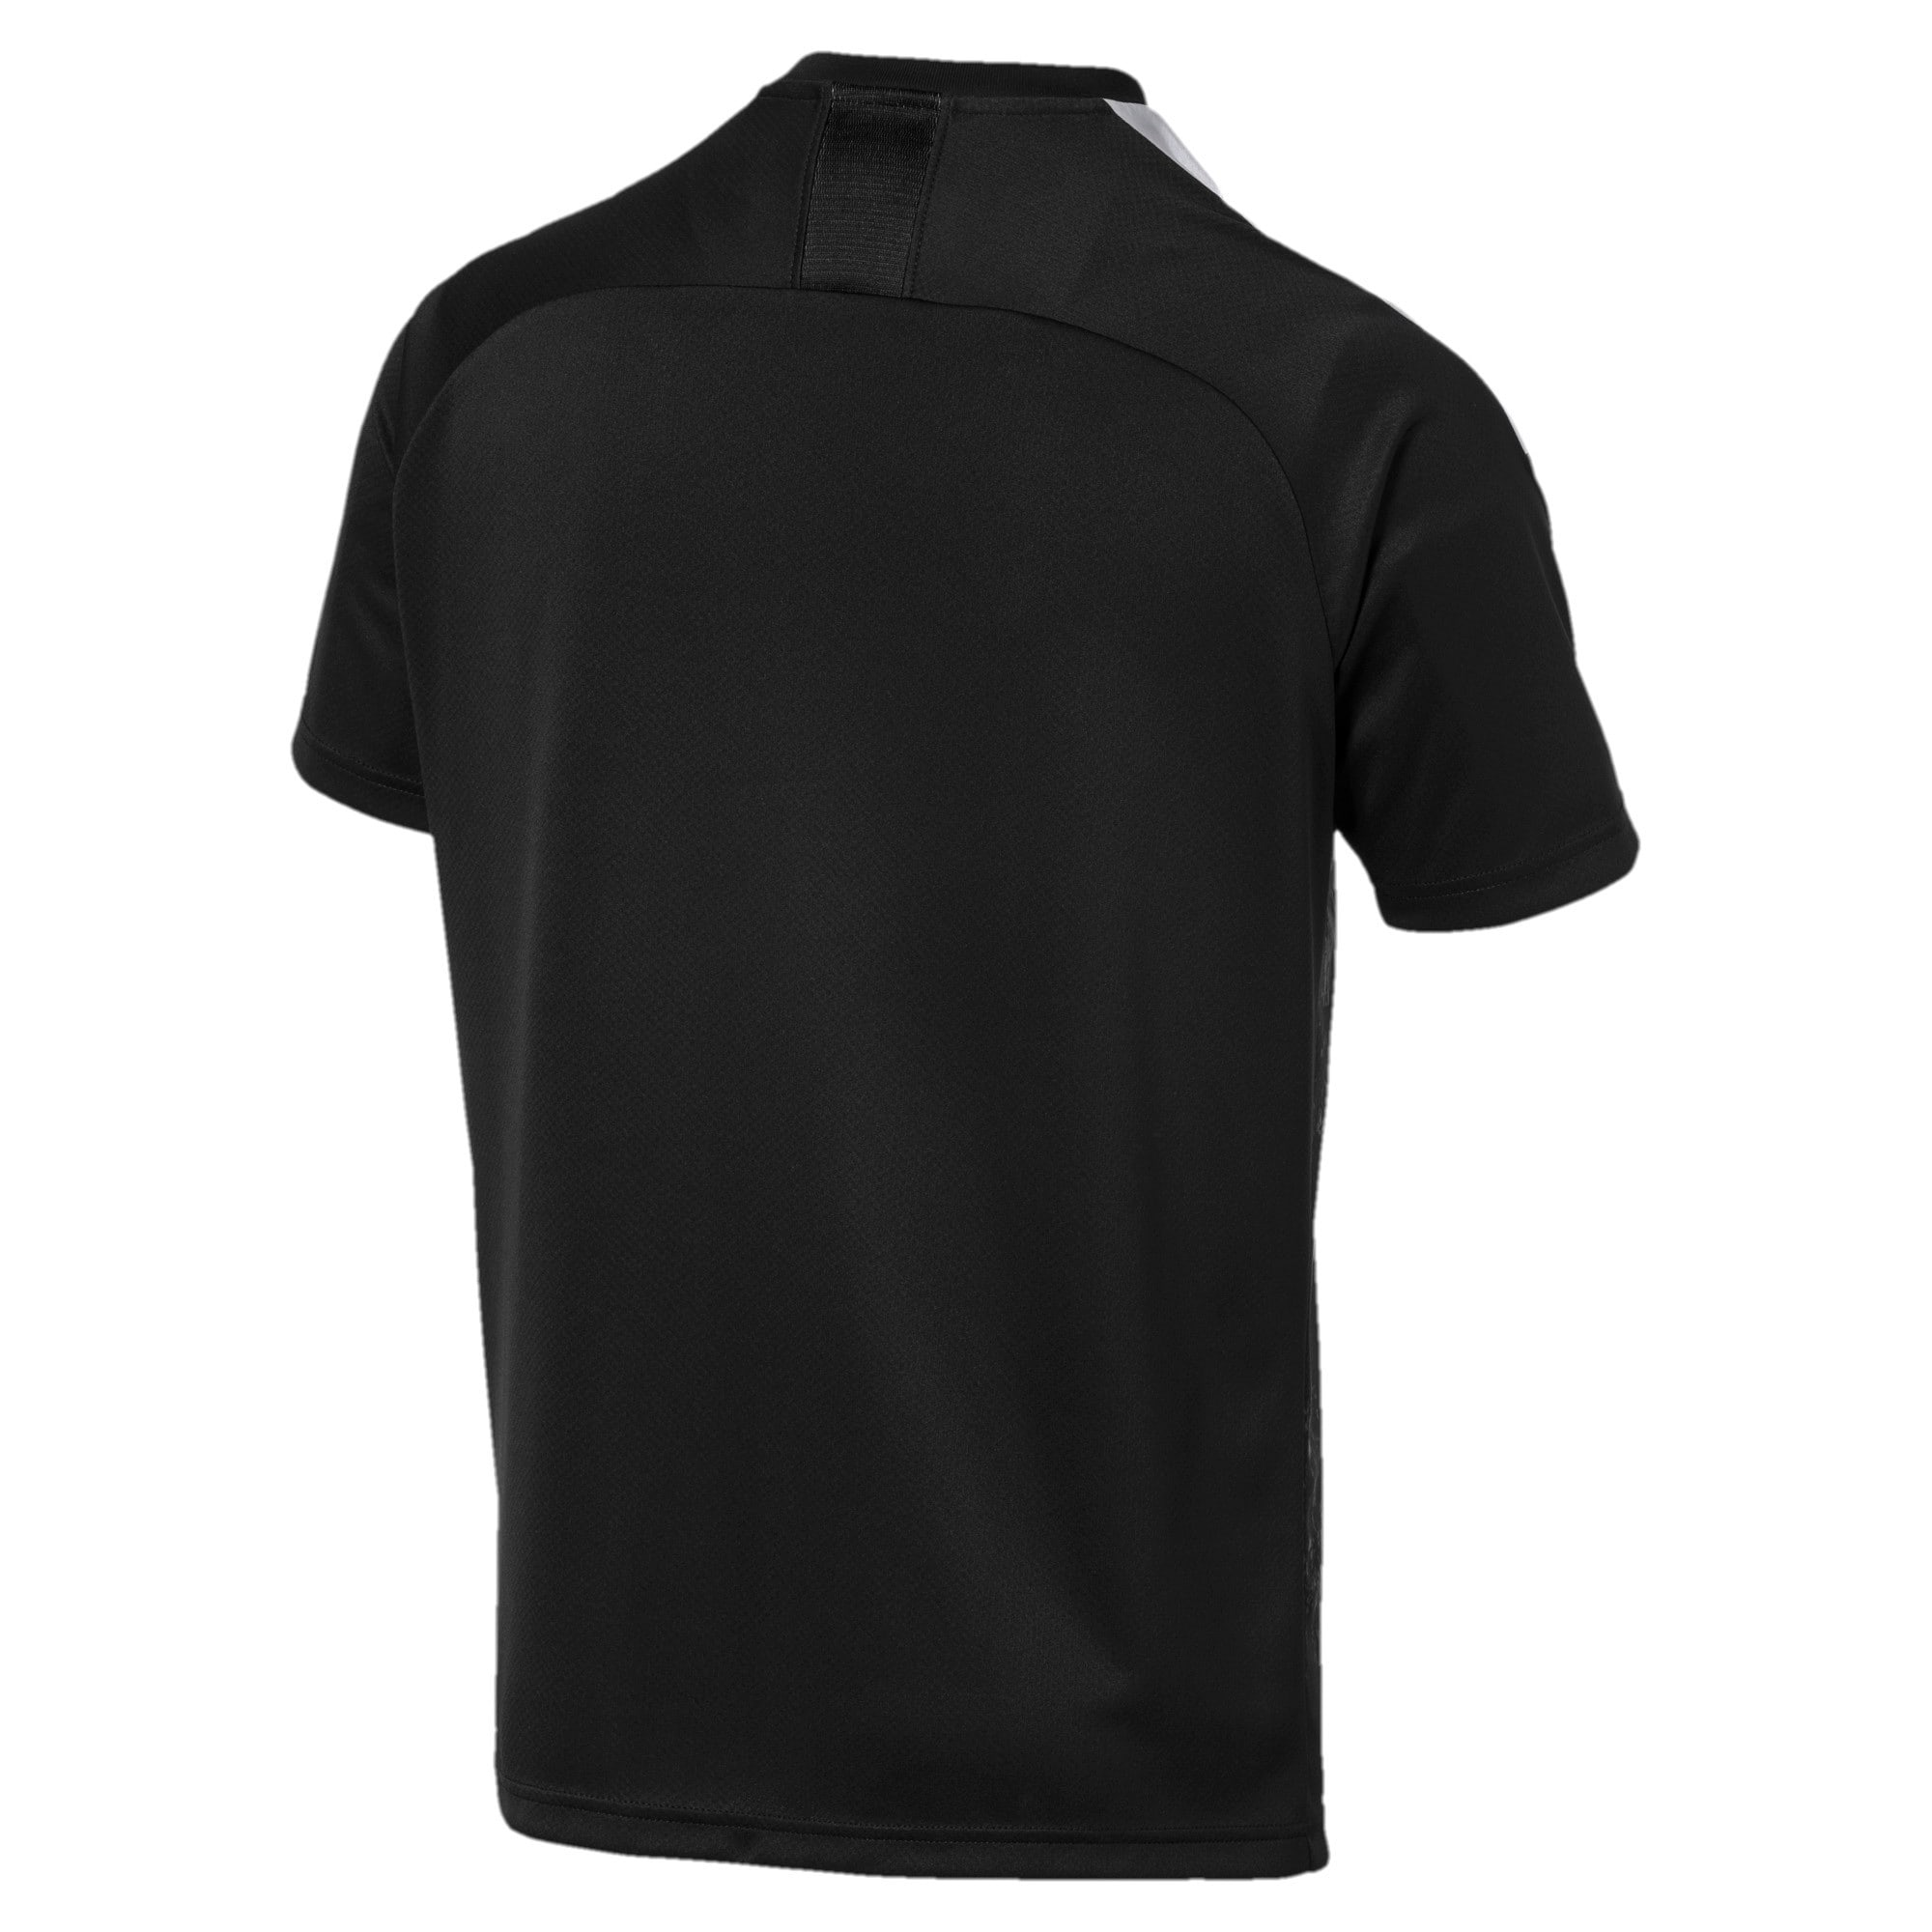 Thumbnail 2 of BVB Men's Away Replica Jersey, Puma Black, medium